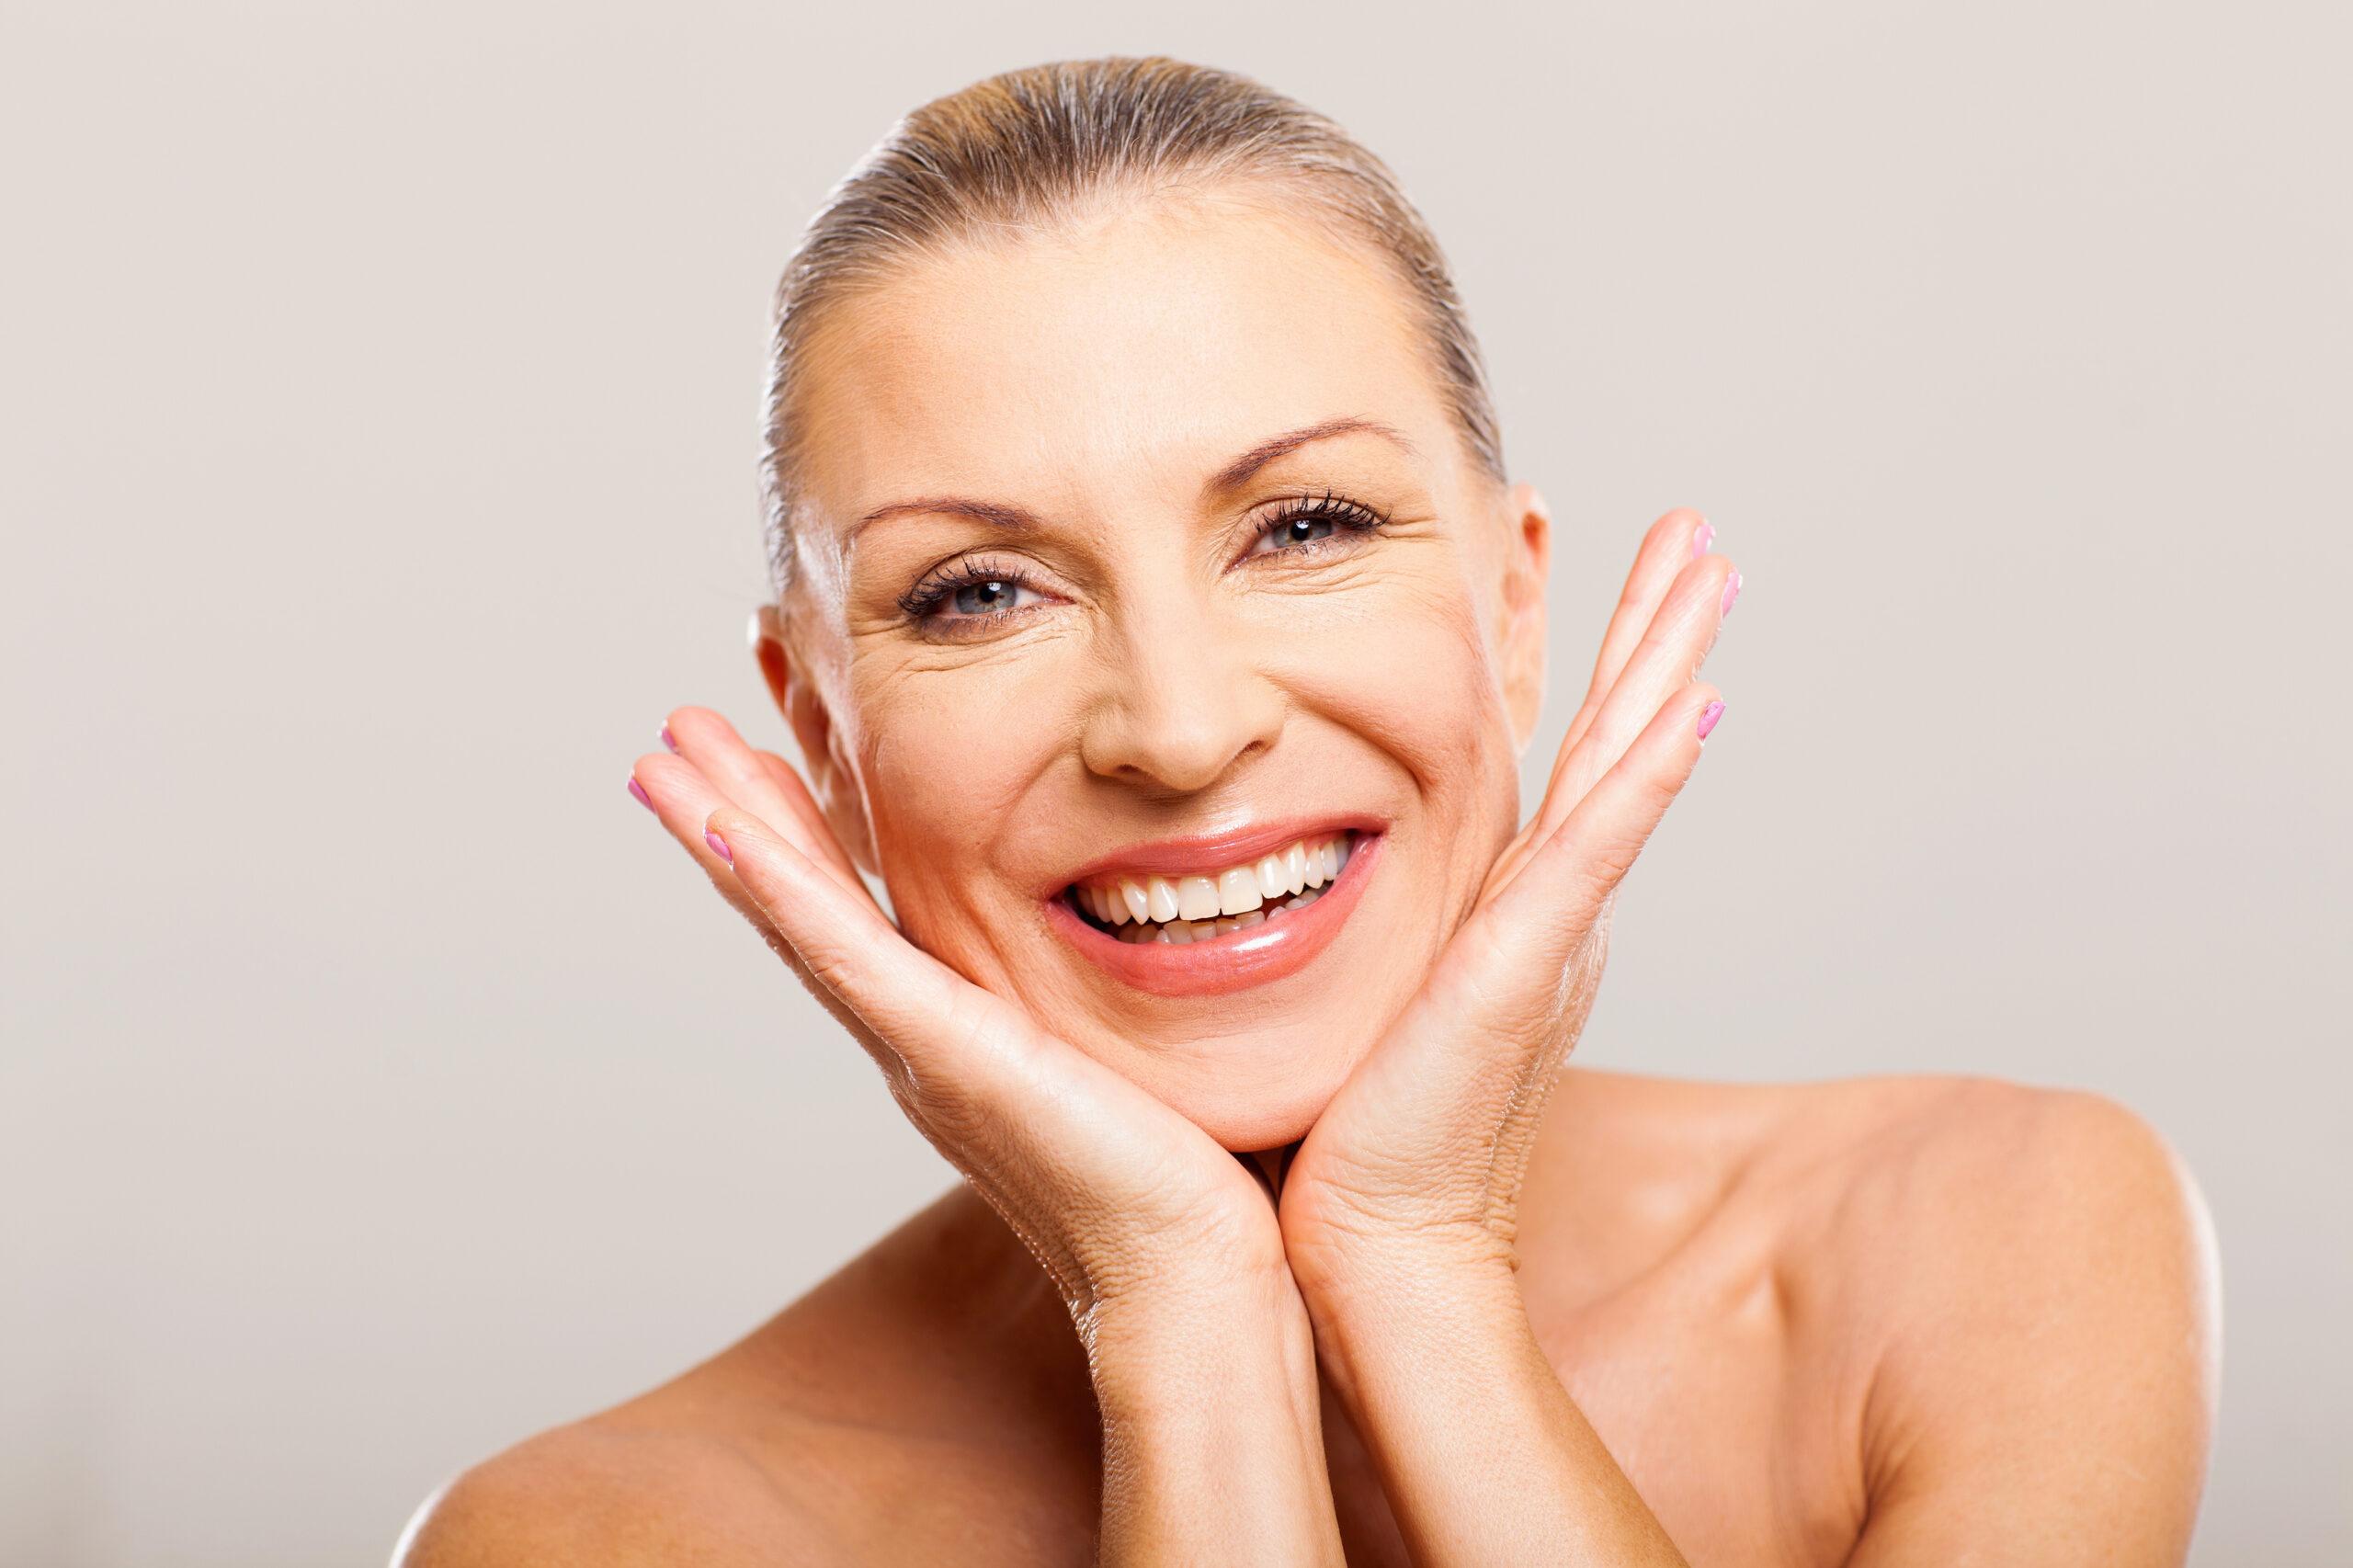 Berman Cosmetic Surgery & Skin Care Center - Facial Surgical Procedures